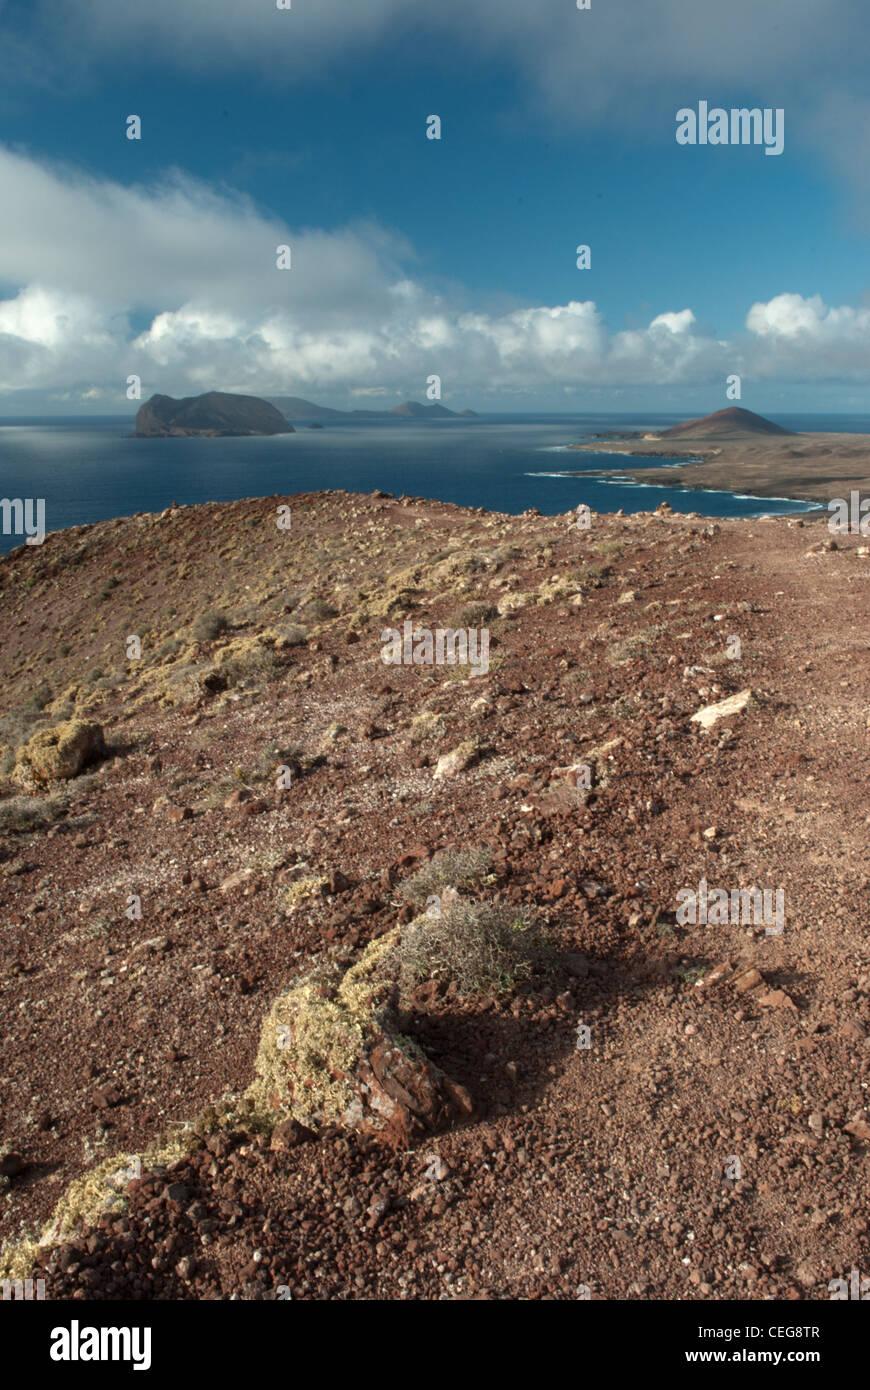 Blick vom Montana Amarilla auf die Insel Graciosa zum Chinijo-Archipel Stockbild